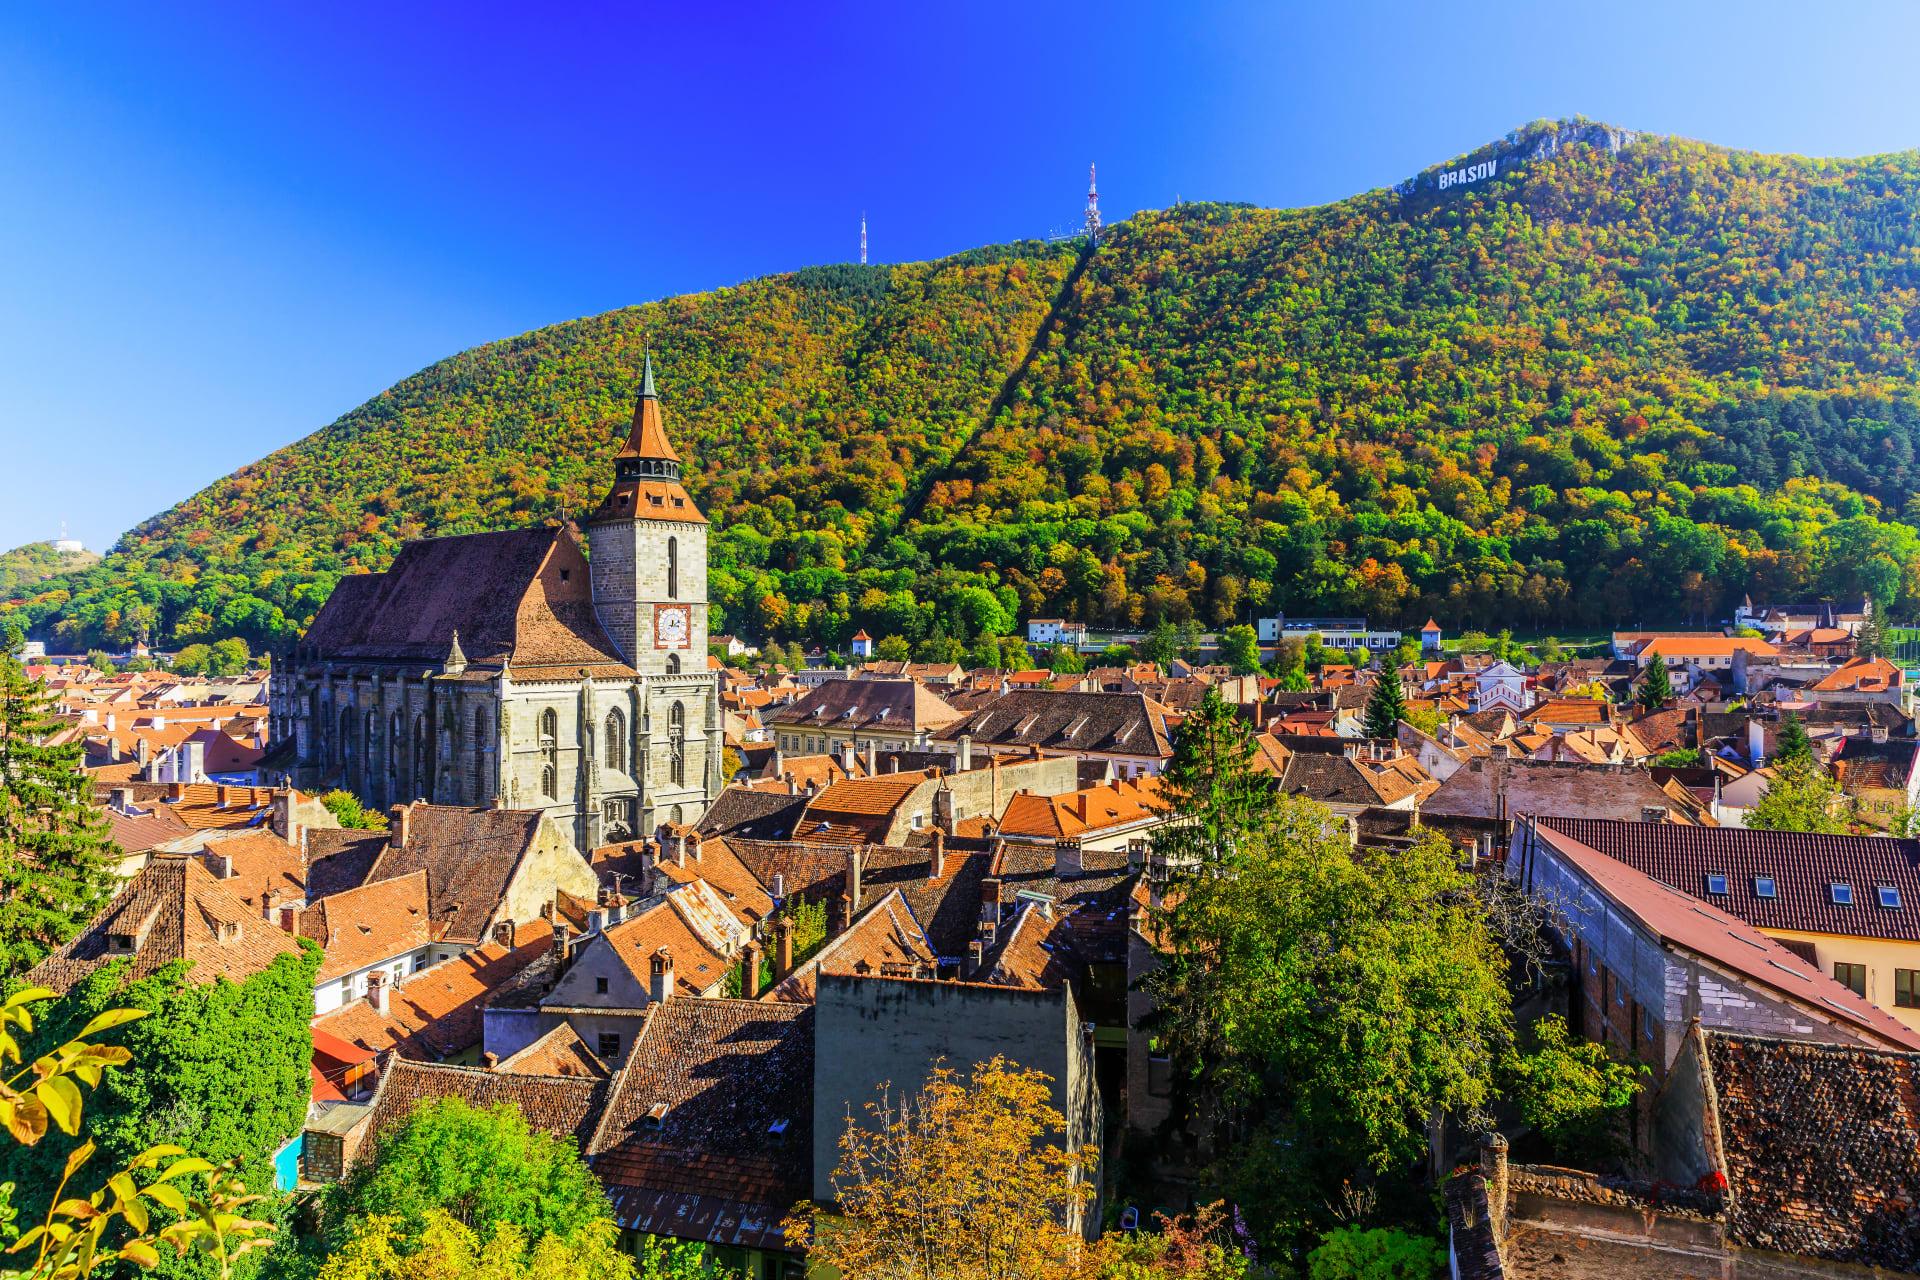 Transylvania - The medieval city of Brasov, the Crown of Transylvania